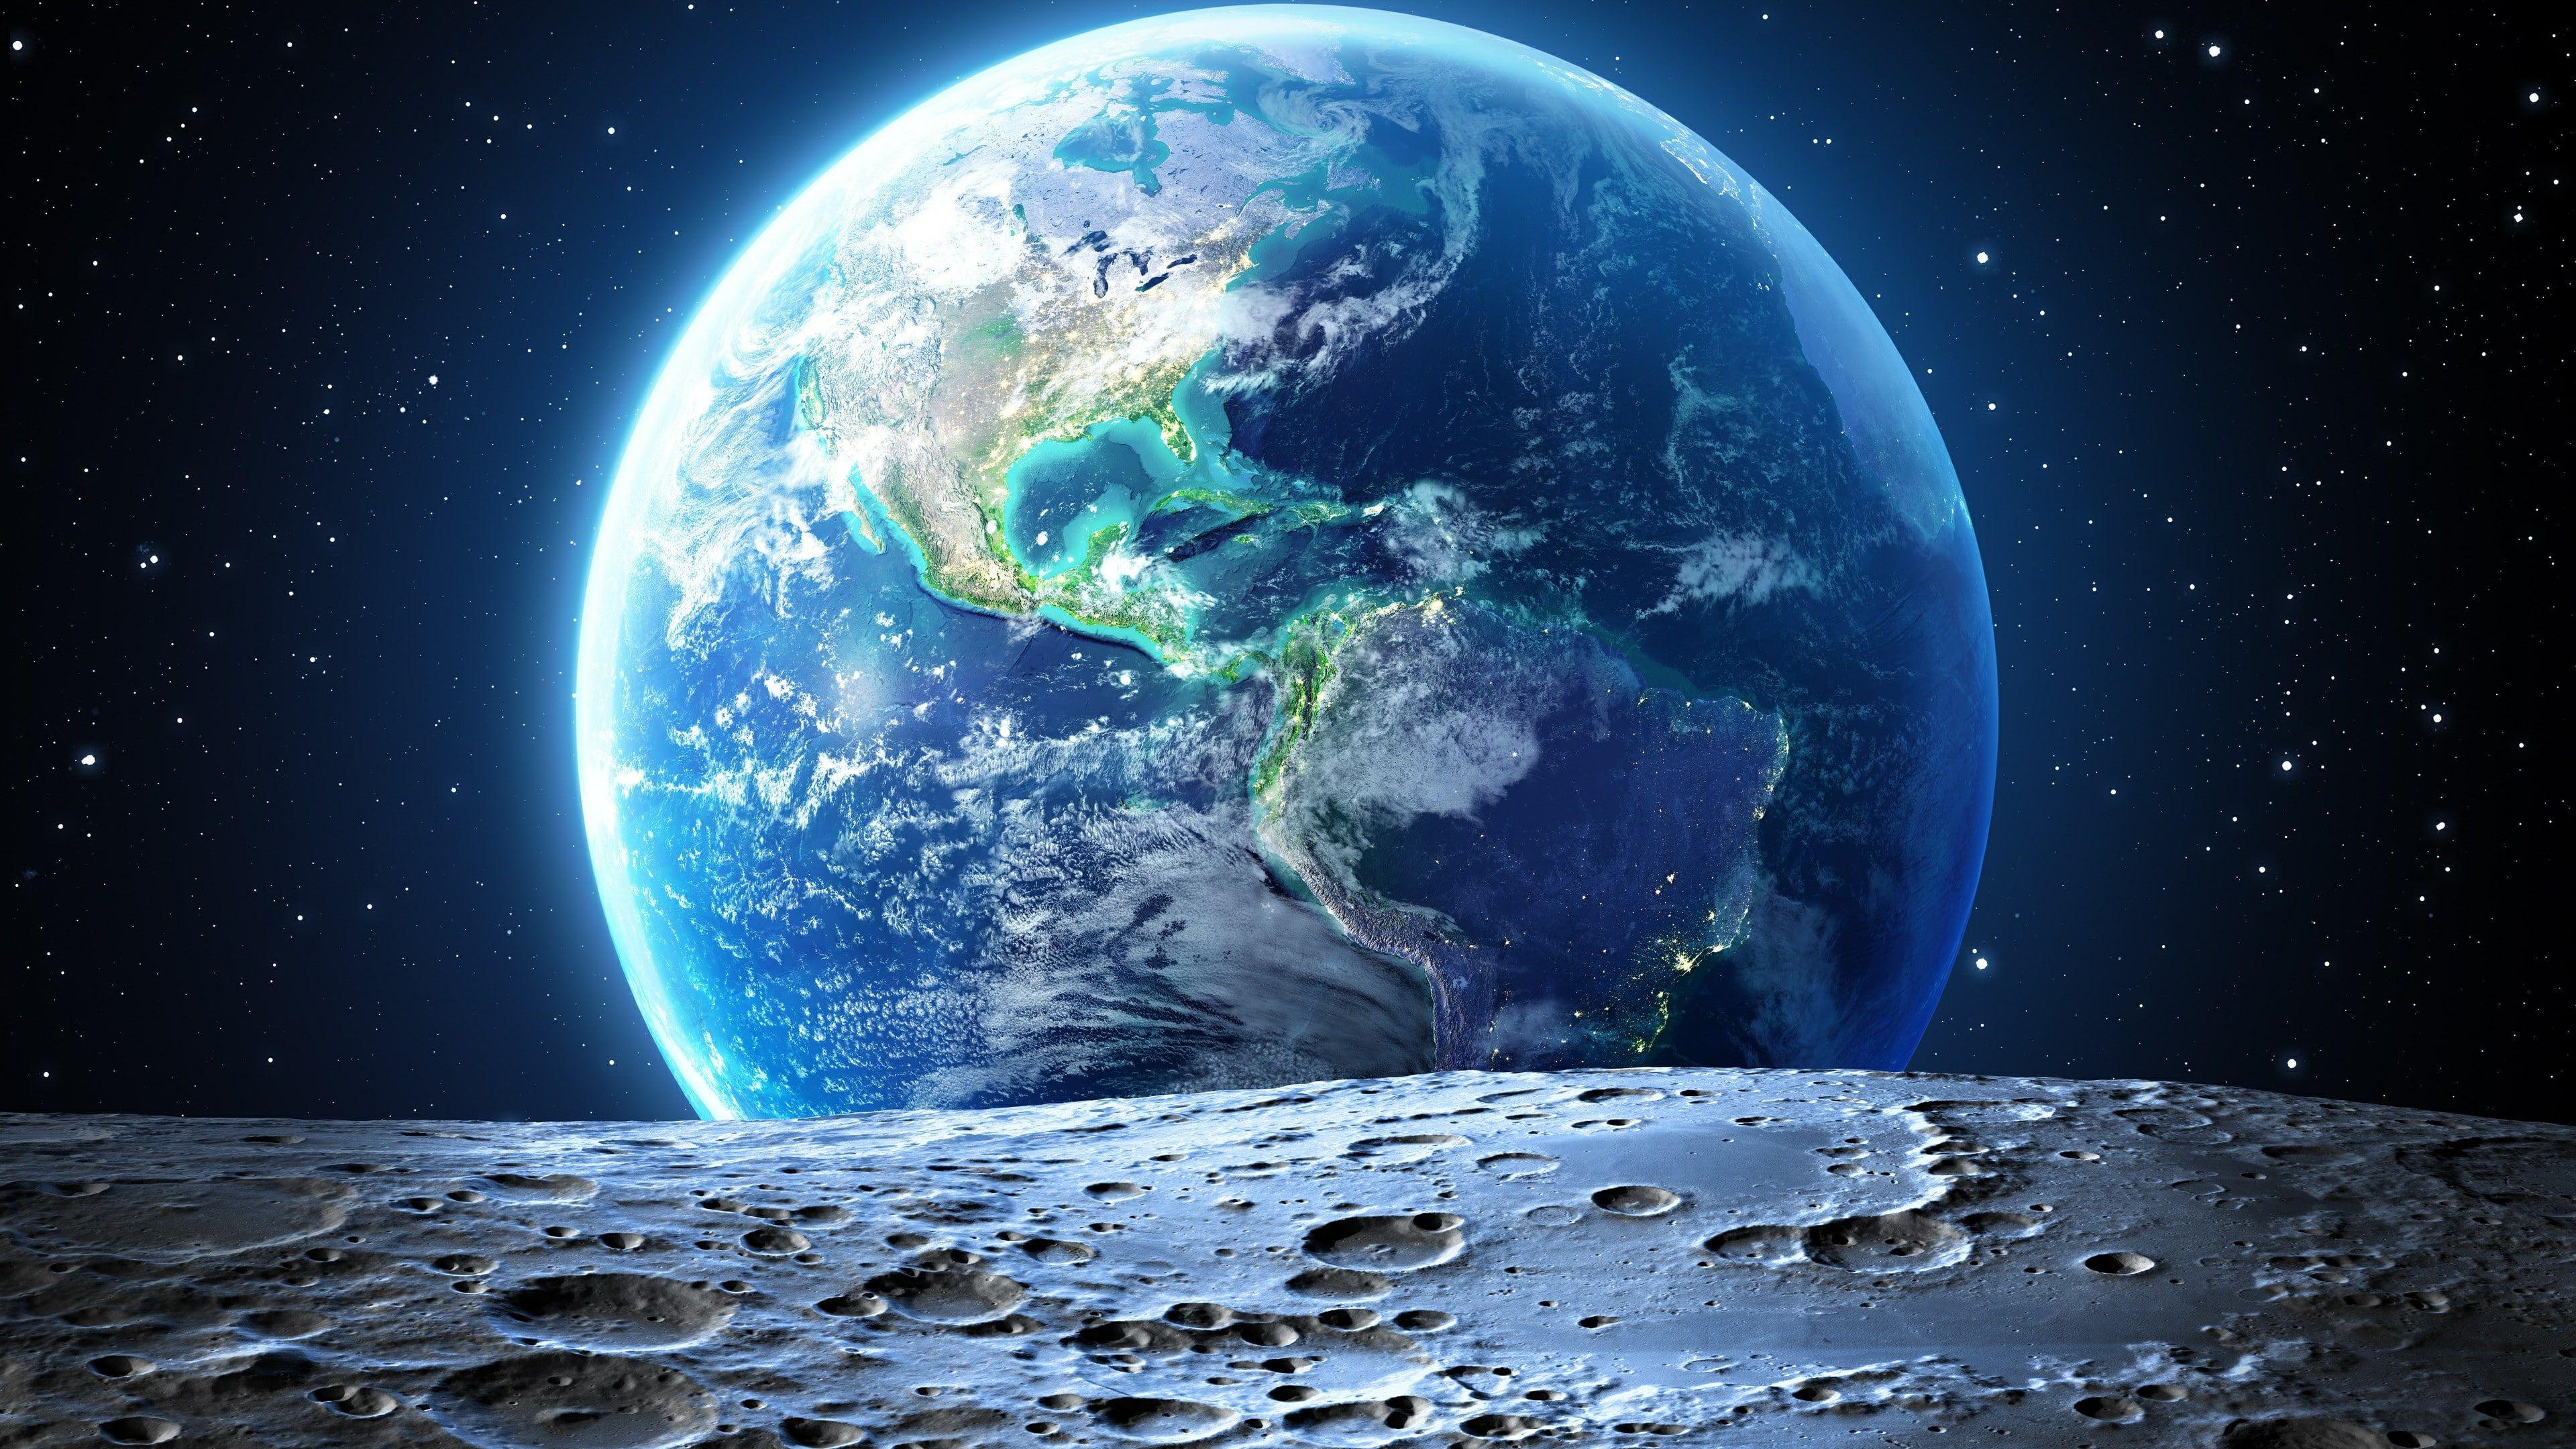 Earth Planet Stars Blue Marble Universe World Sky Space 4k Wallpaper Hdwallpaper Desktop Wallpaper Earth Earth View Wallpaper Space